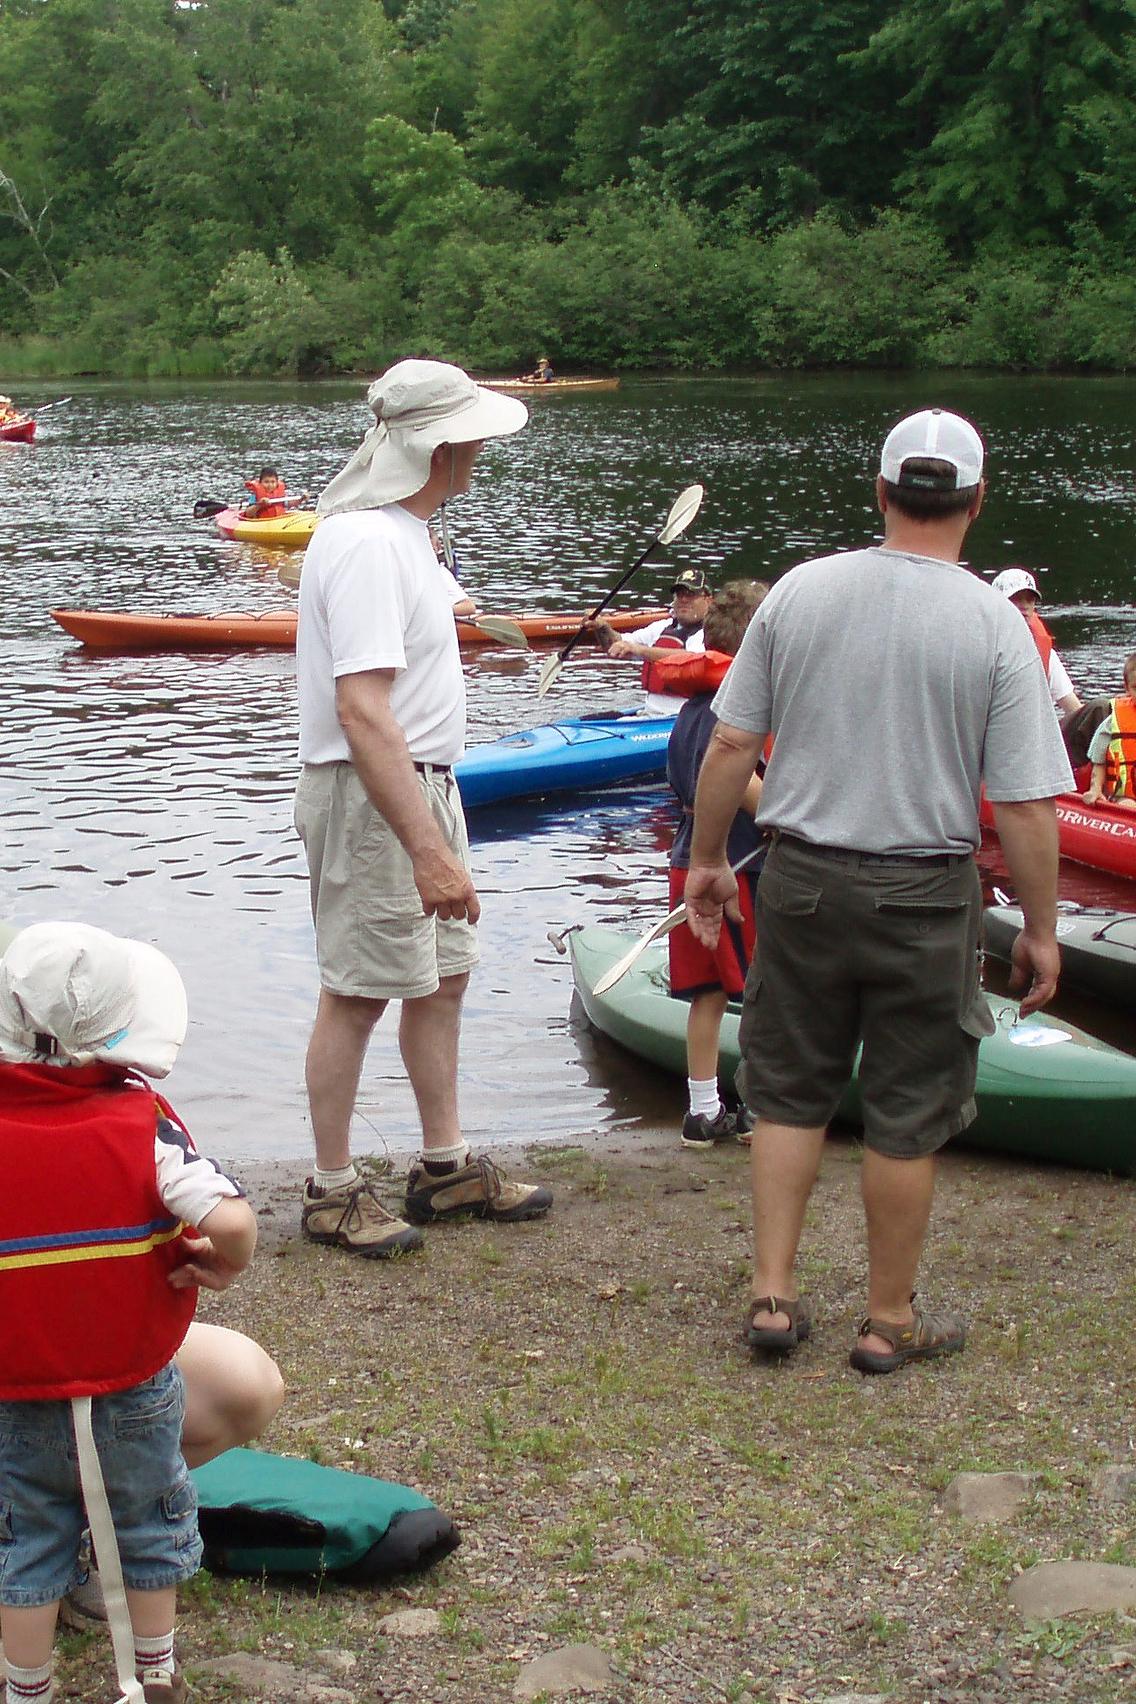 Men helping young children in kayaks on shore of lake